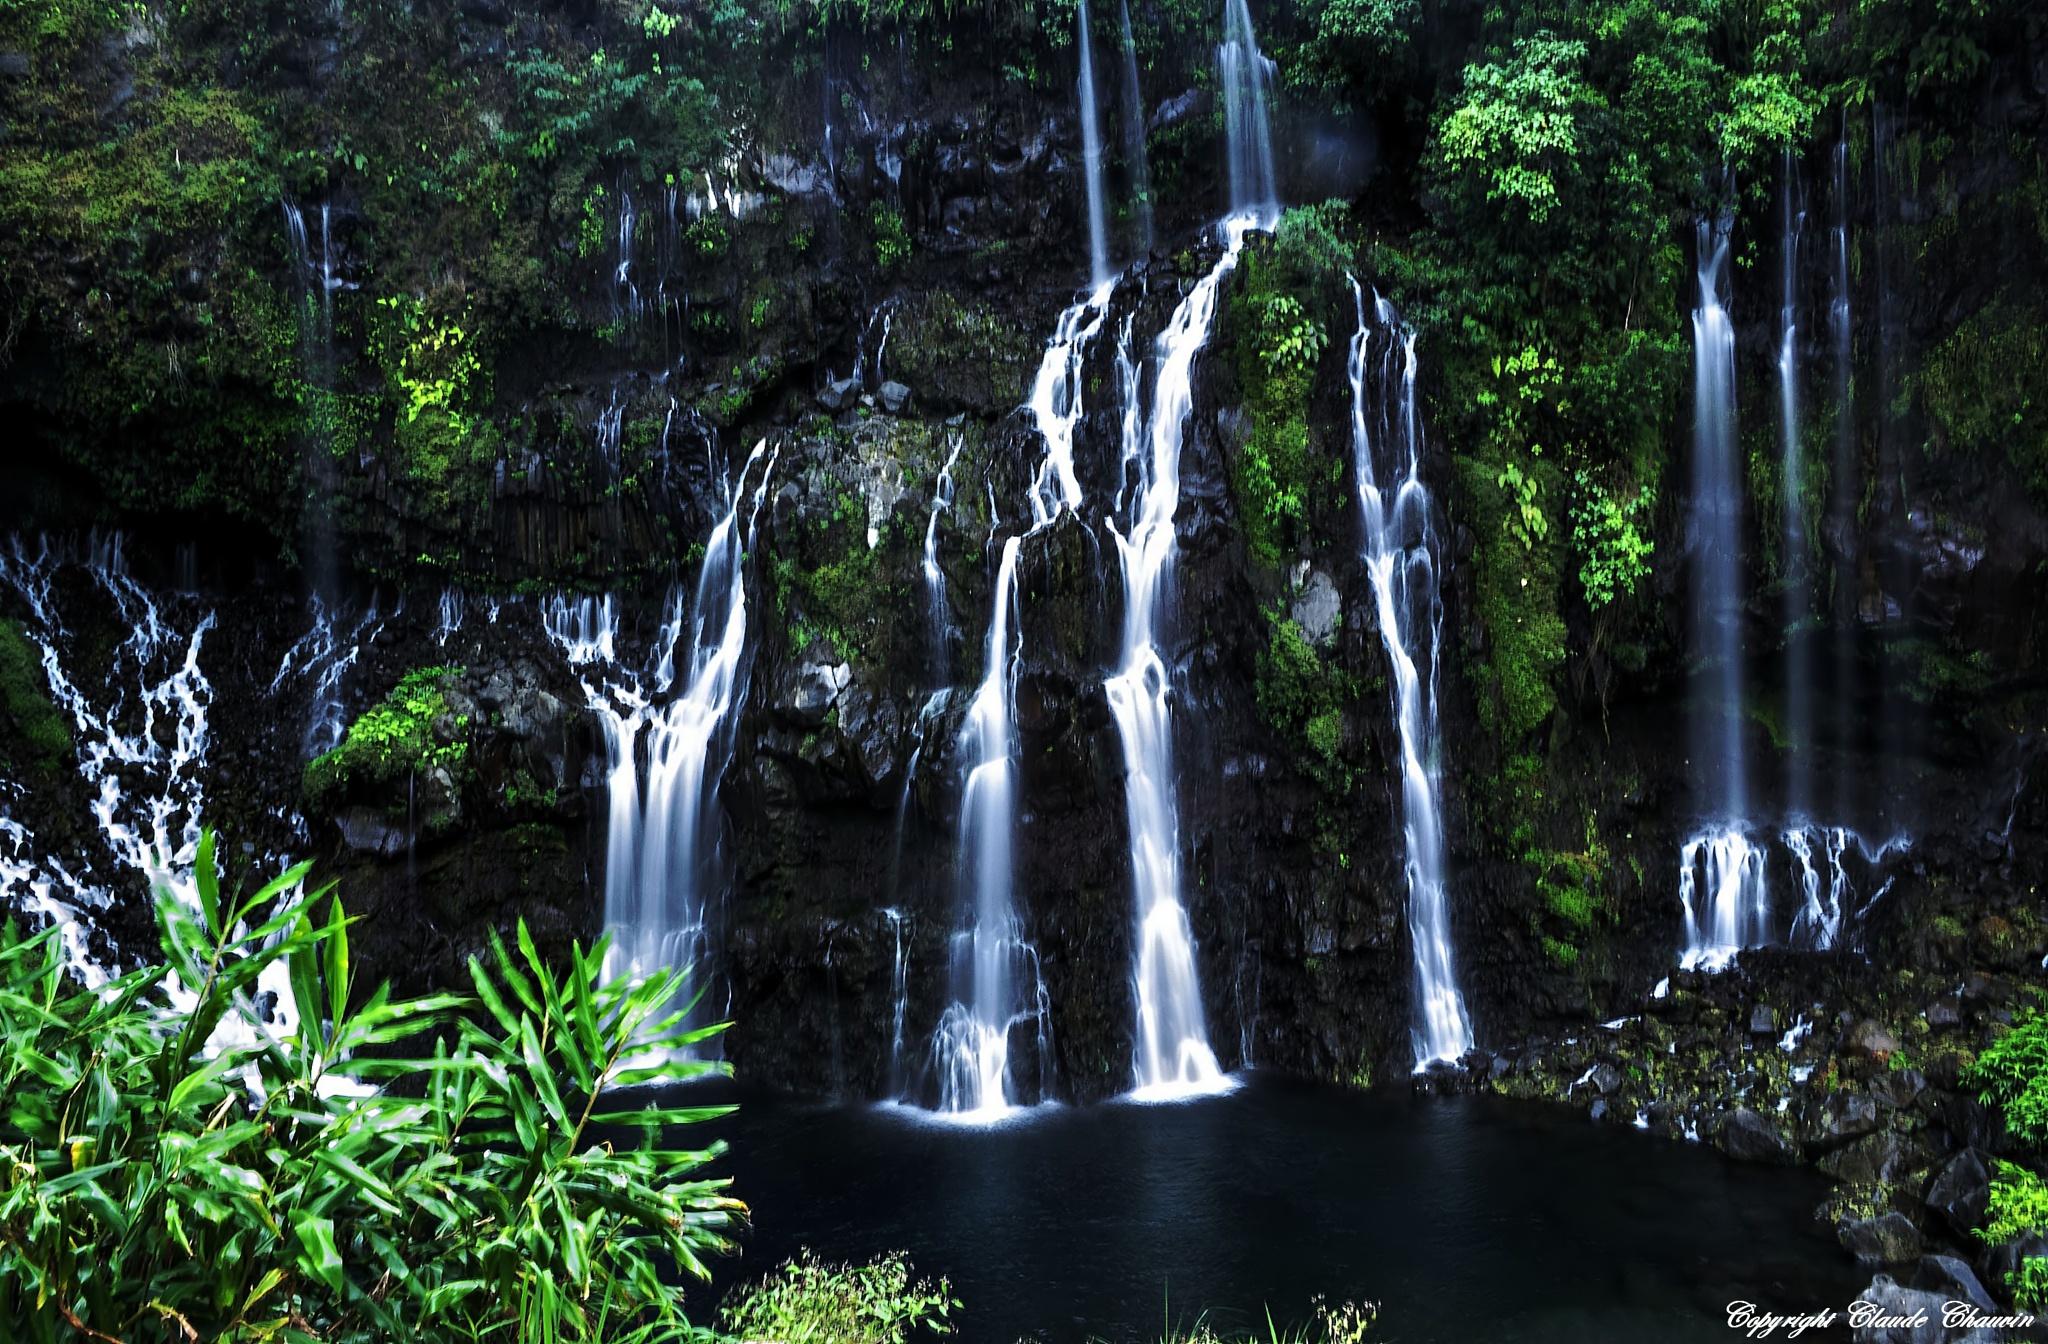 Blue Waterfall  by claudechauvin67